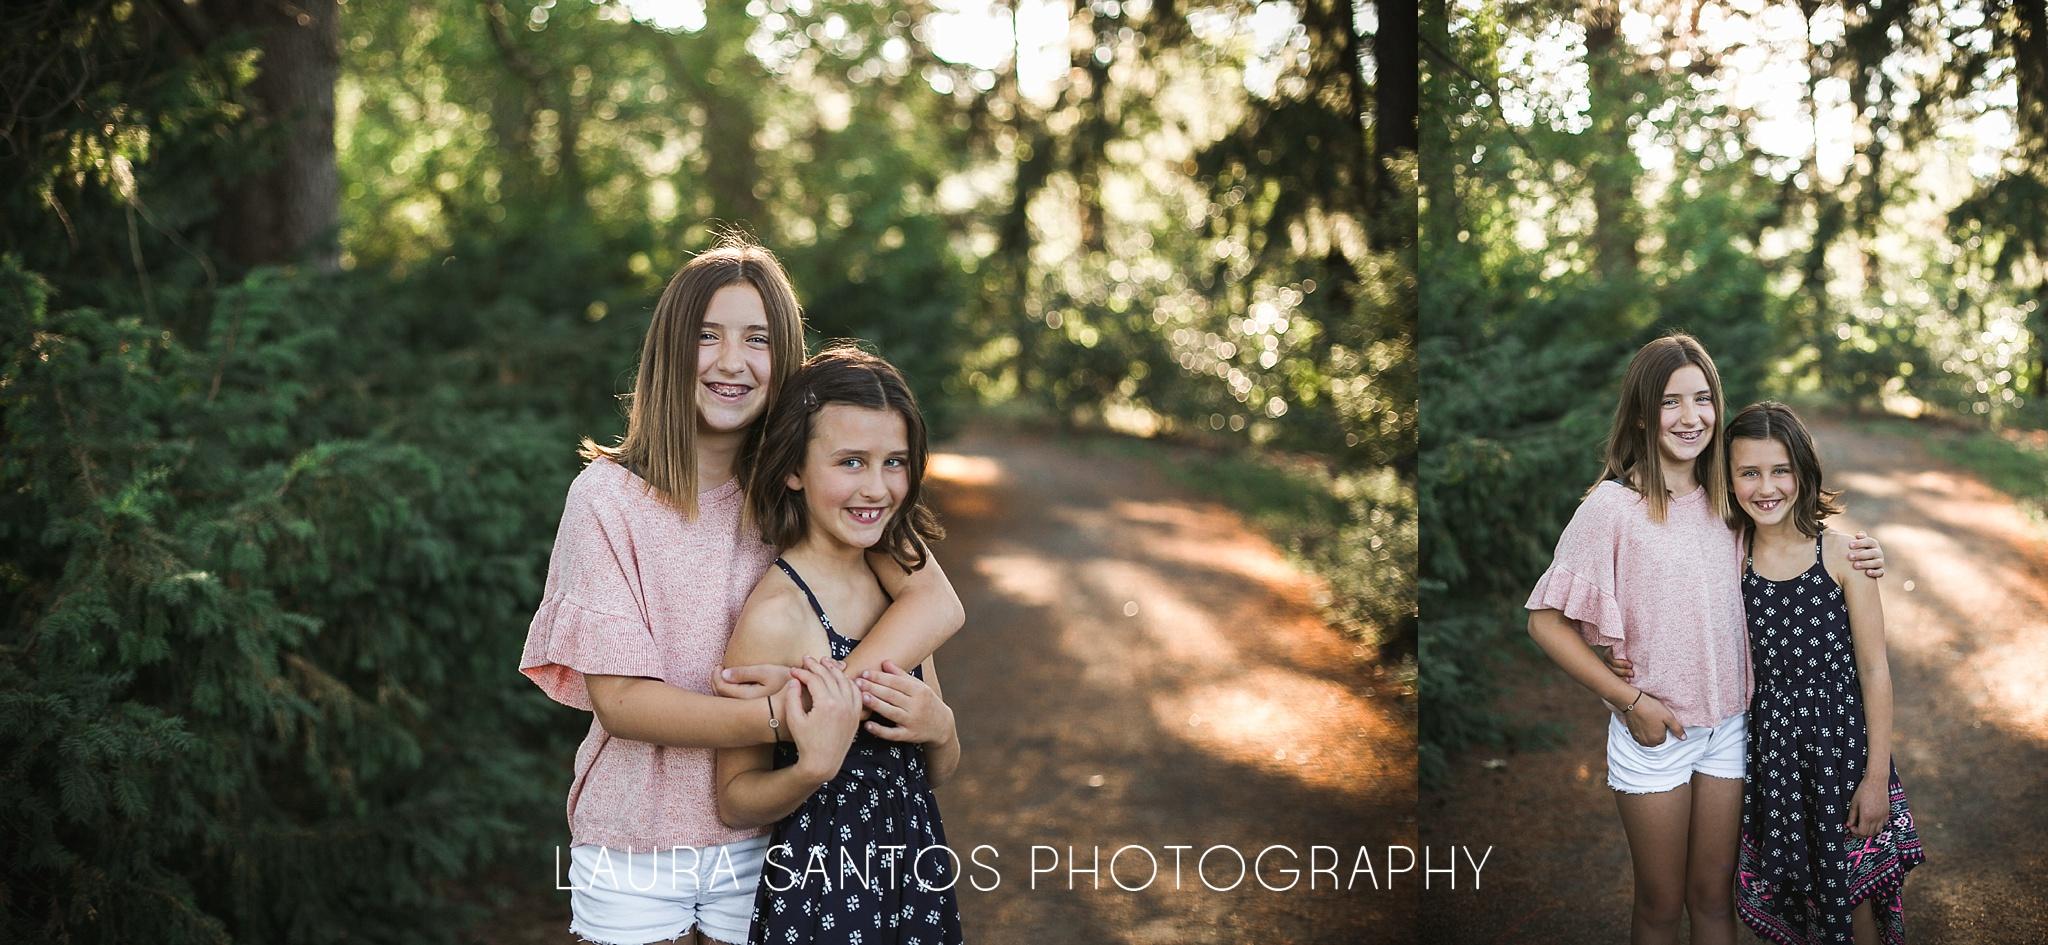 Laura Santos Photography Portland Oregon Family Photographer_0076.jpg